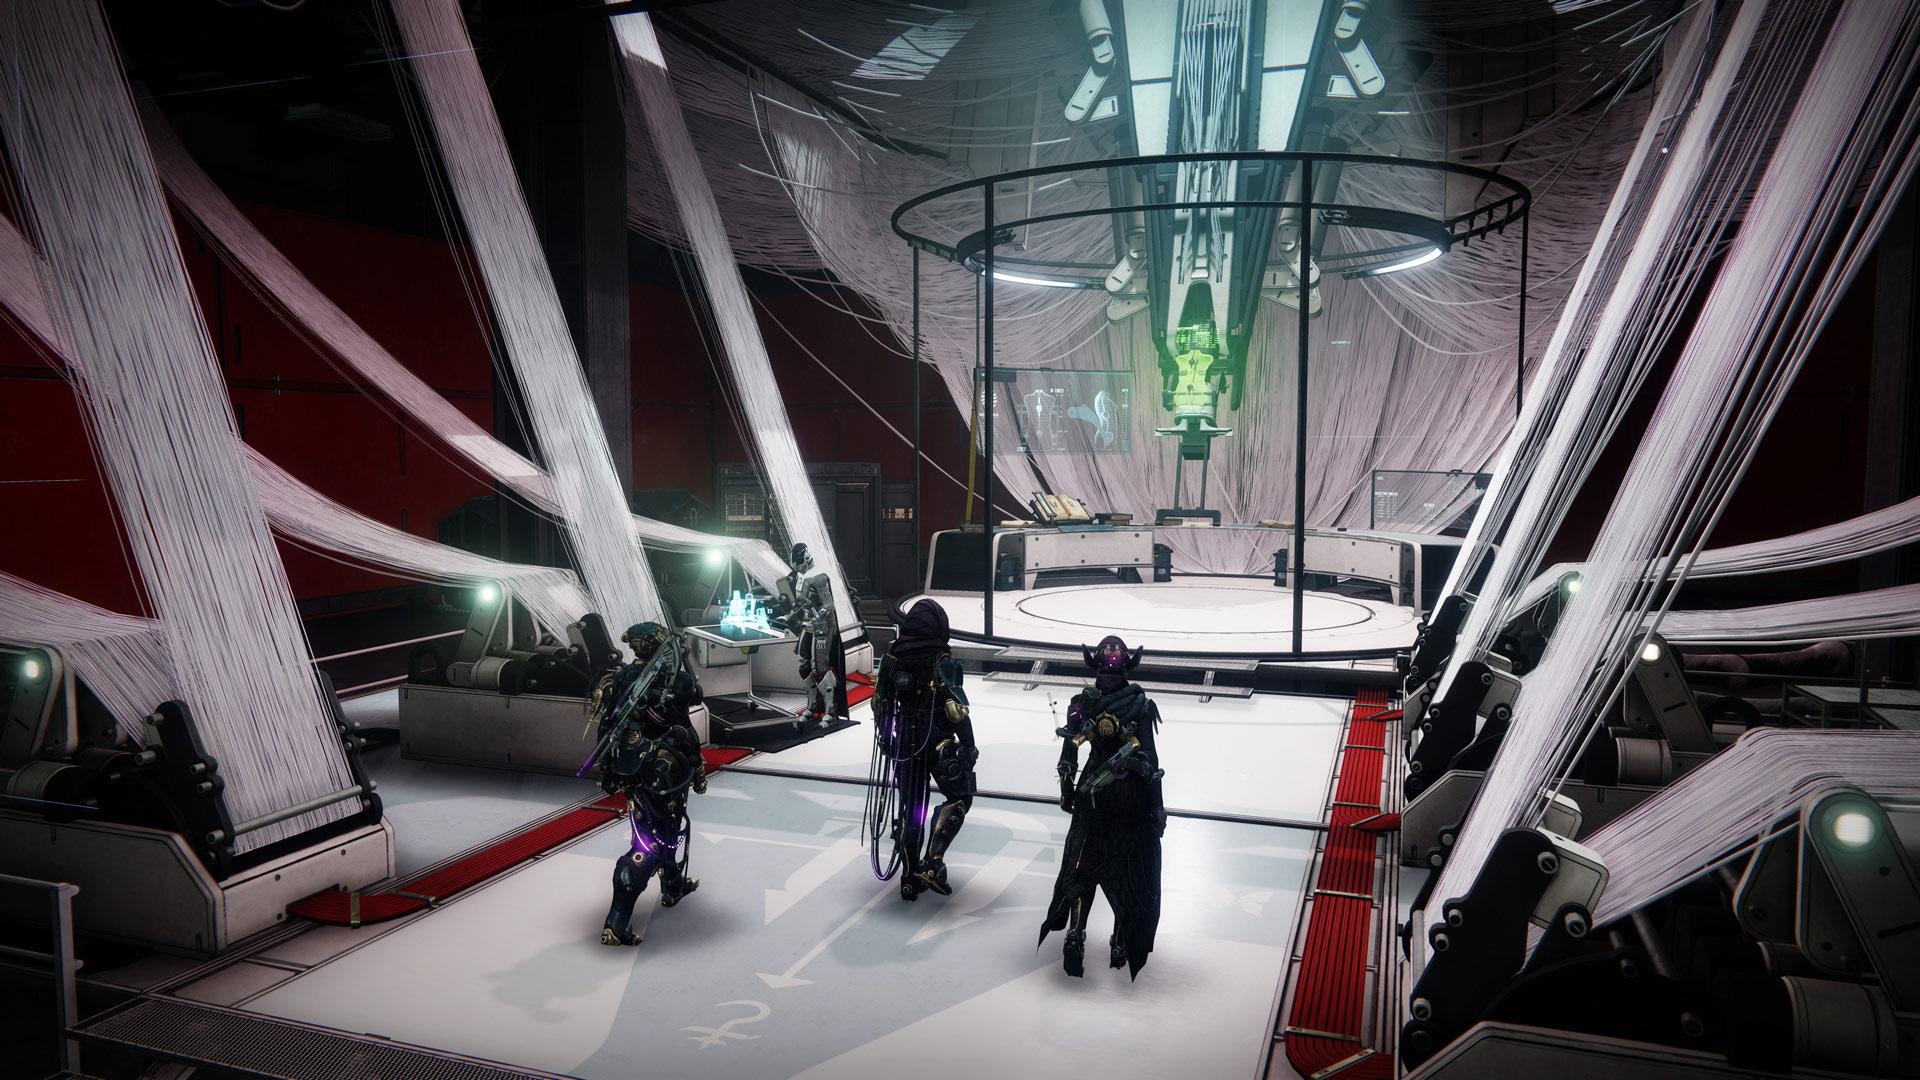 destiny 2 update 3.2.0.1 patch notes